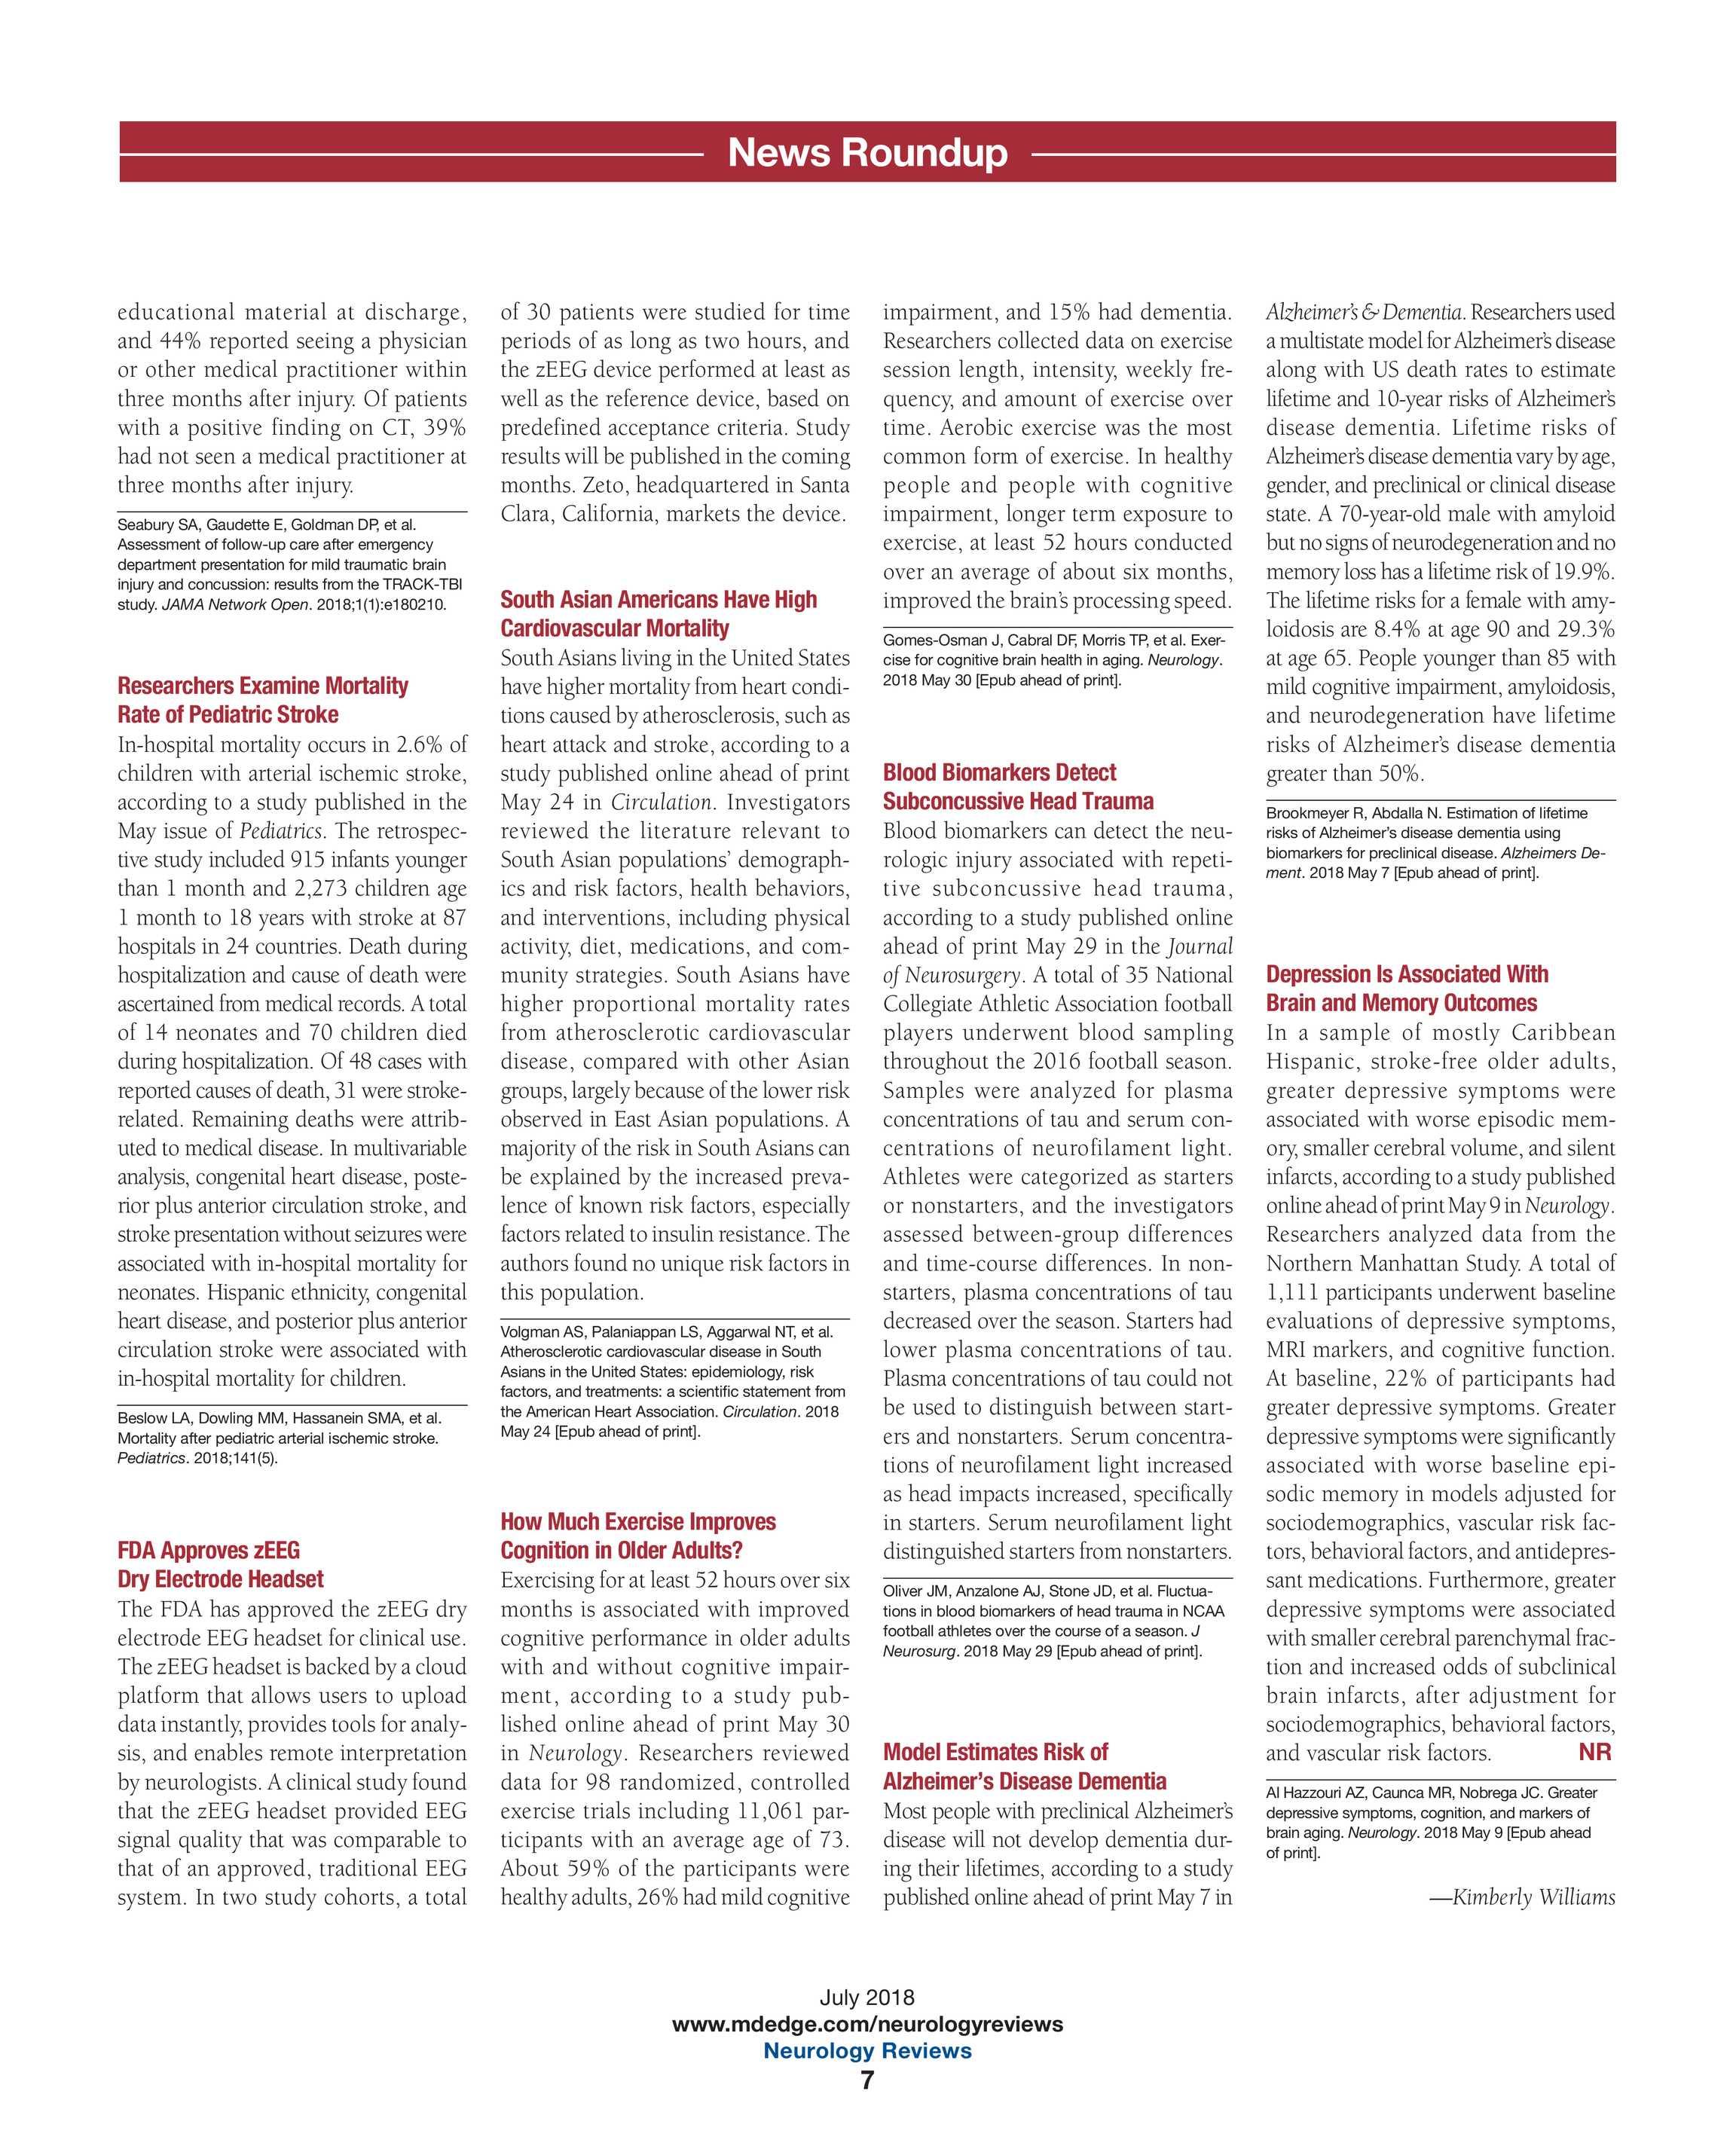 Neurology Reviews - NR July 2018 - page 6